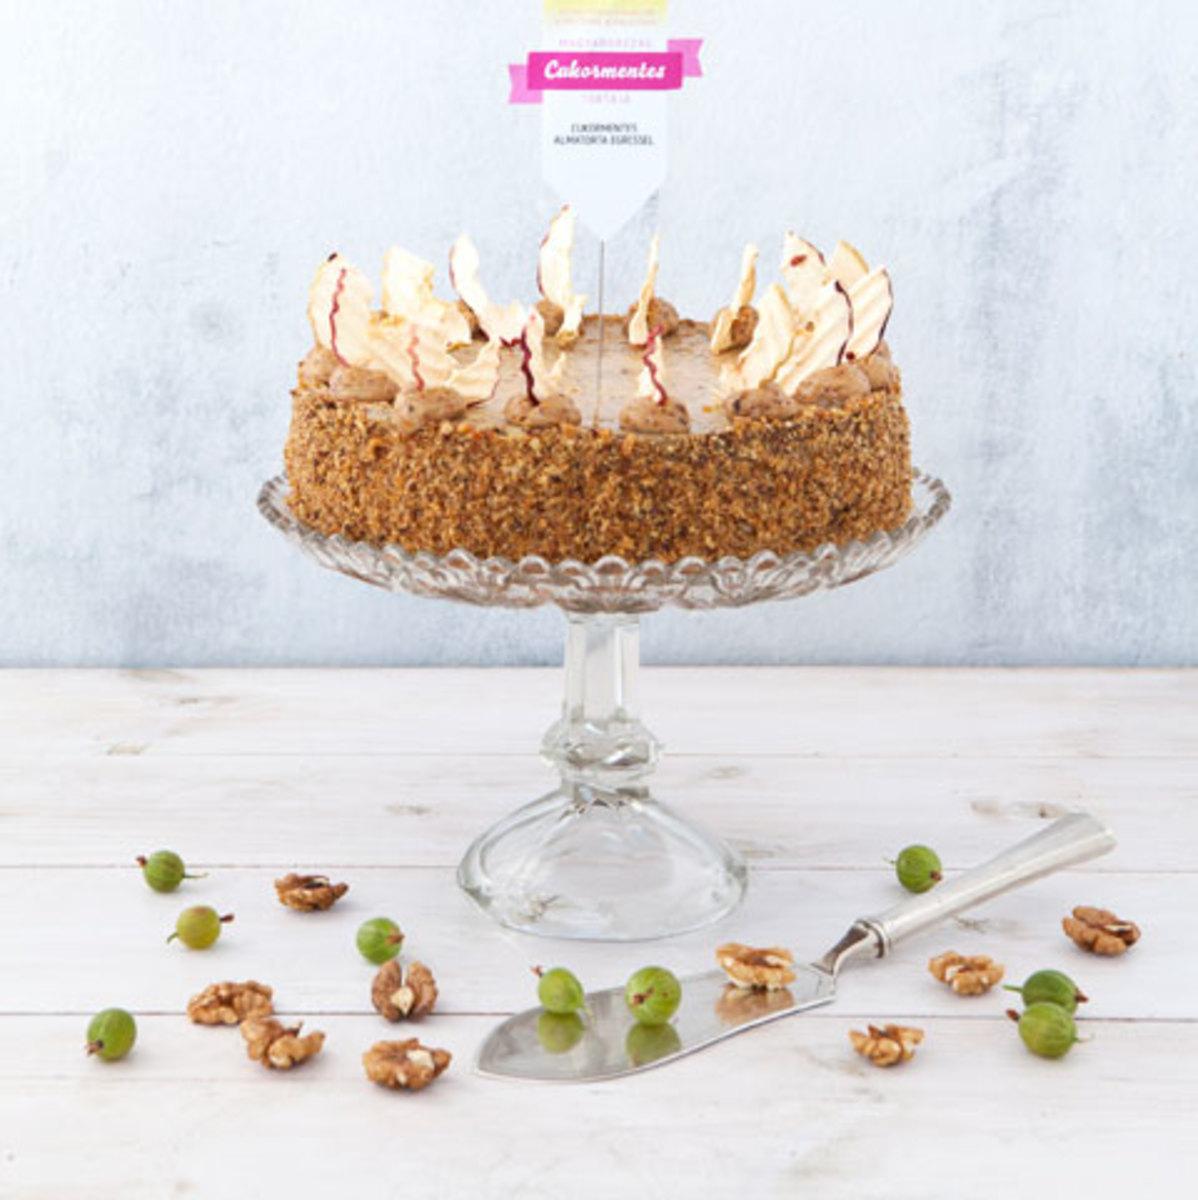 Gooseberry apple cake